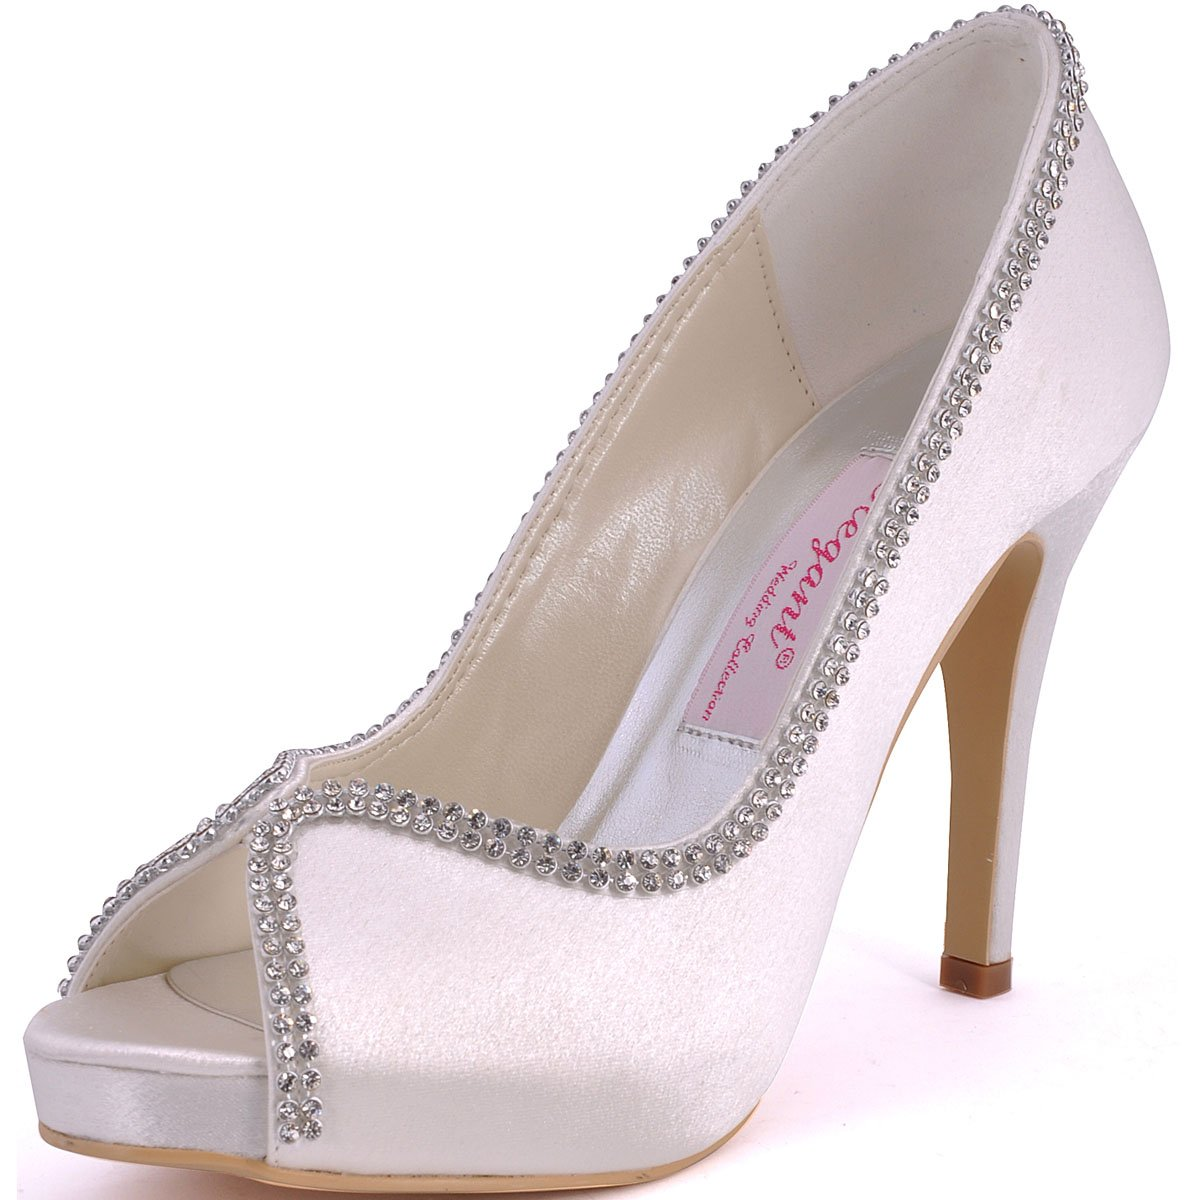 ElegantPark EP11083 Women Pumps Peep Toe Rhinestones Platform High Heel Satin Evening Wedding Dress Shoes B00ARD14X2 6 B(M) US (true fitting 6.5 US)|Ivory